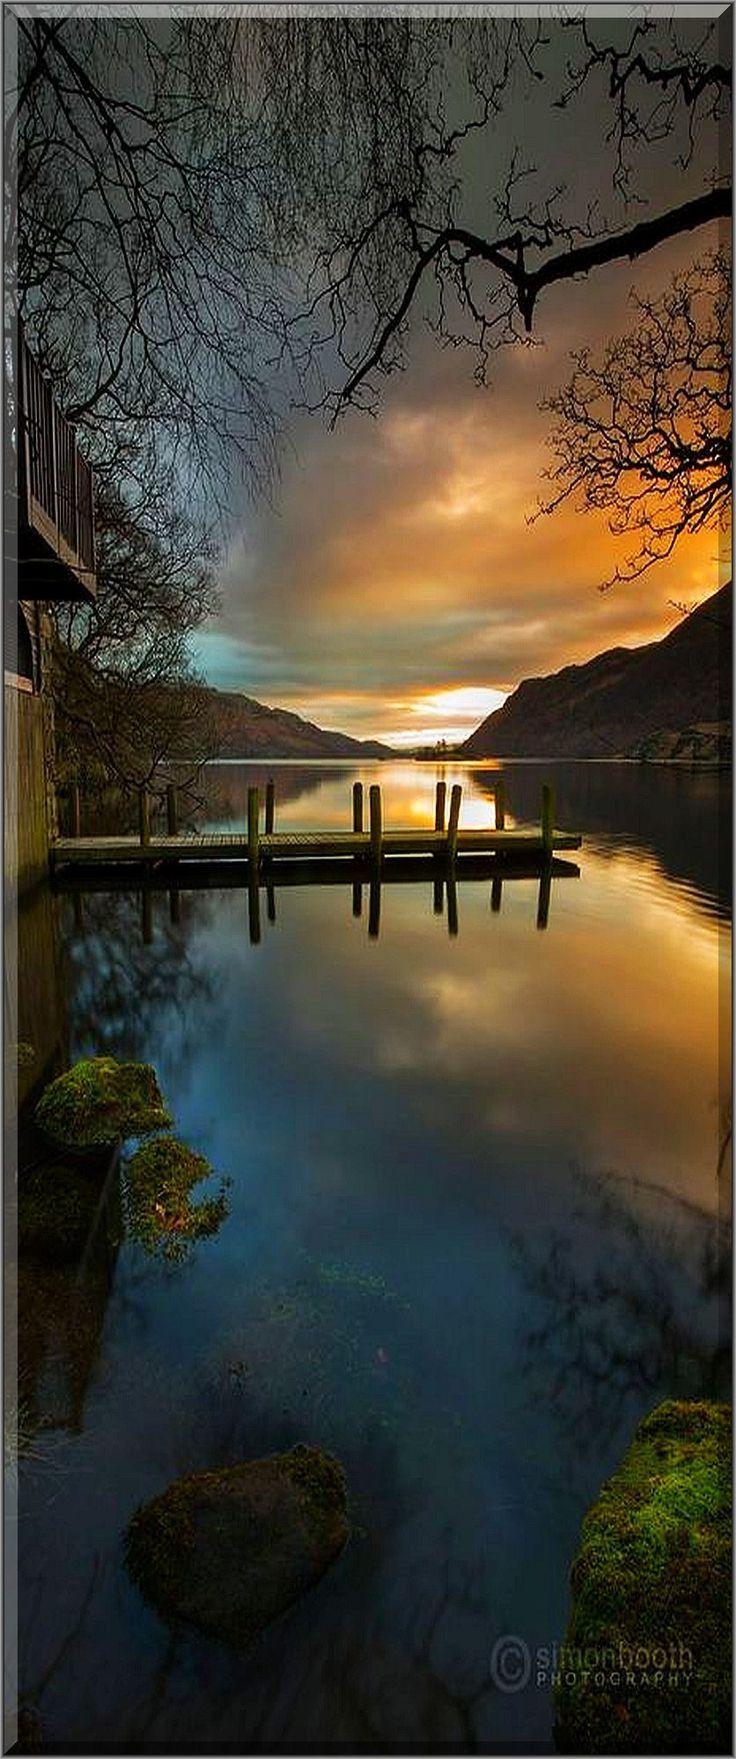 Lake tahoe sunset travel channel pinterest - Ullswater Boathouse Lake District National Park Uk England By Simon Booth Nature Sunset Reflection Lake Aergo Wanderlust Approved